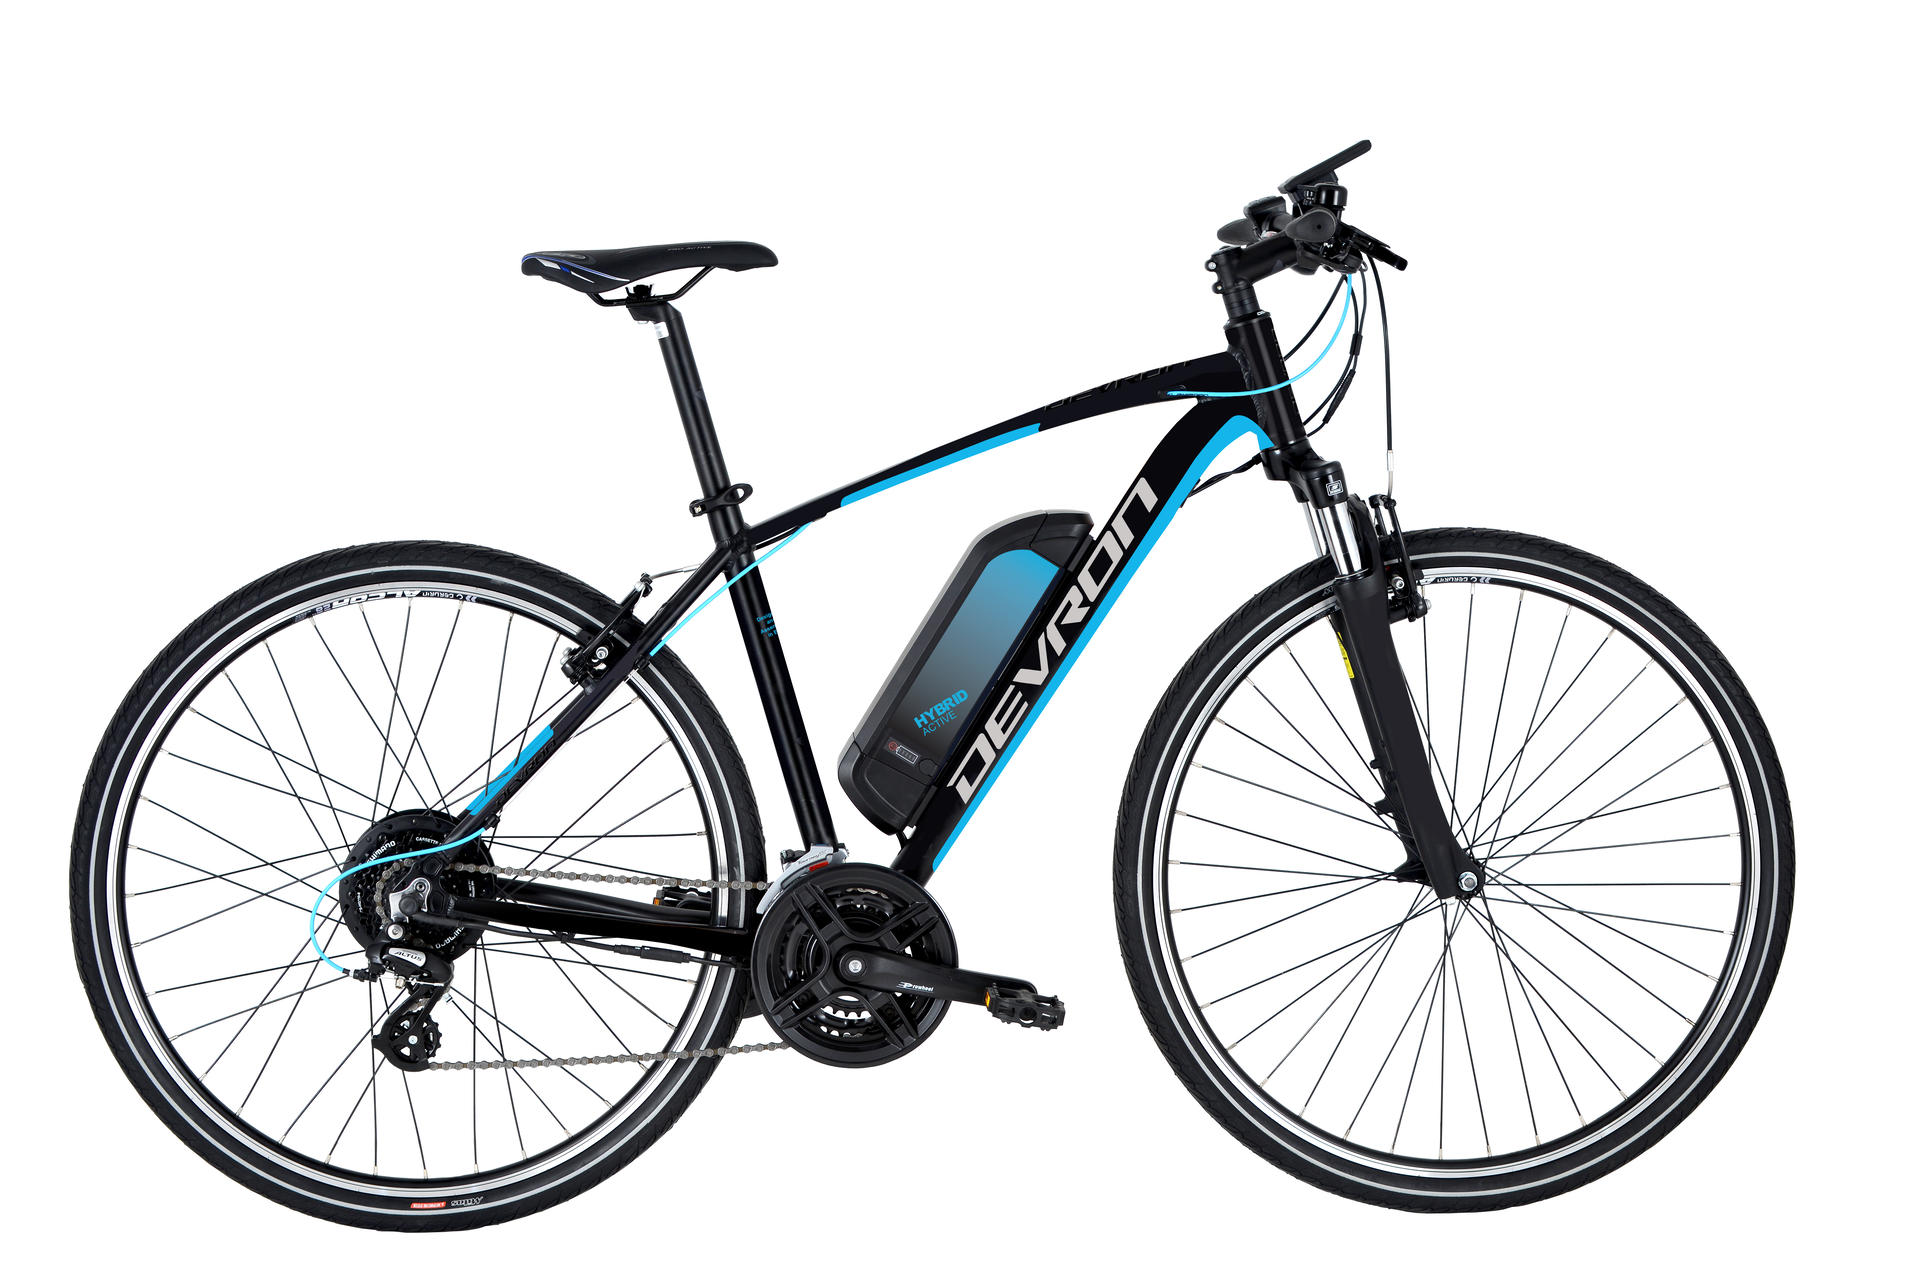 Bicicletta elettrica da cross DEVRON 28161 490mm Black Matt - 28